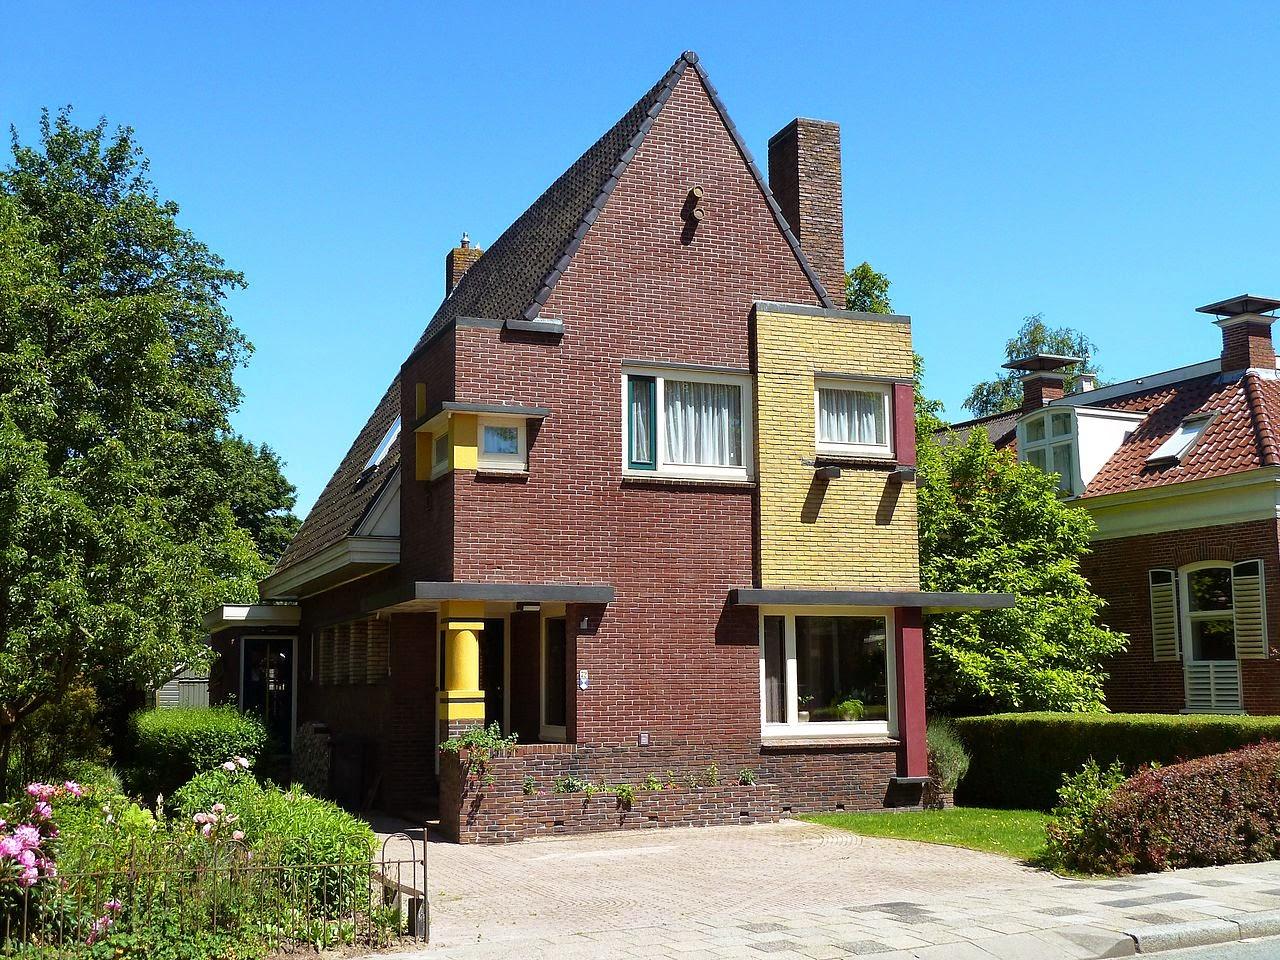 Architecten provincie groningen bekende gebouwen in groningen - Expressionistische architectuur ...